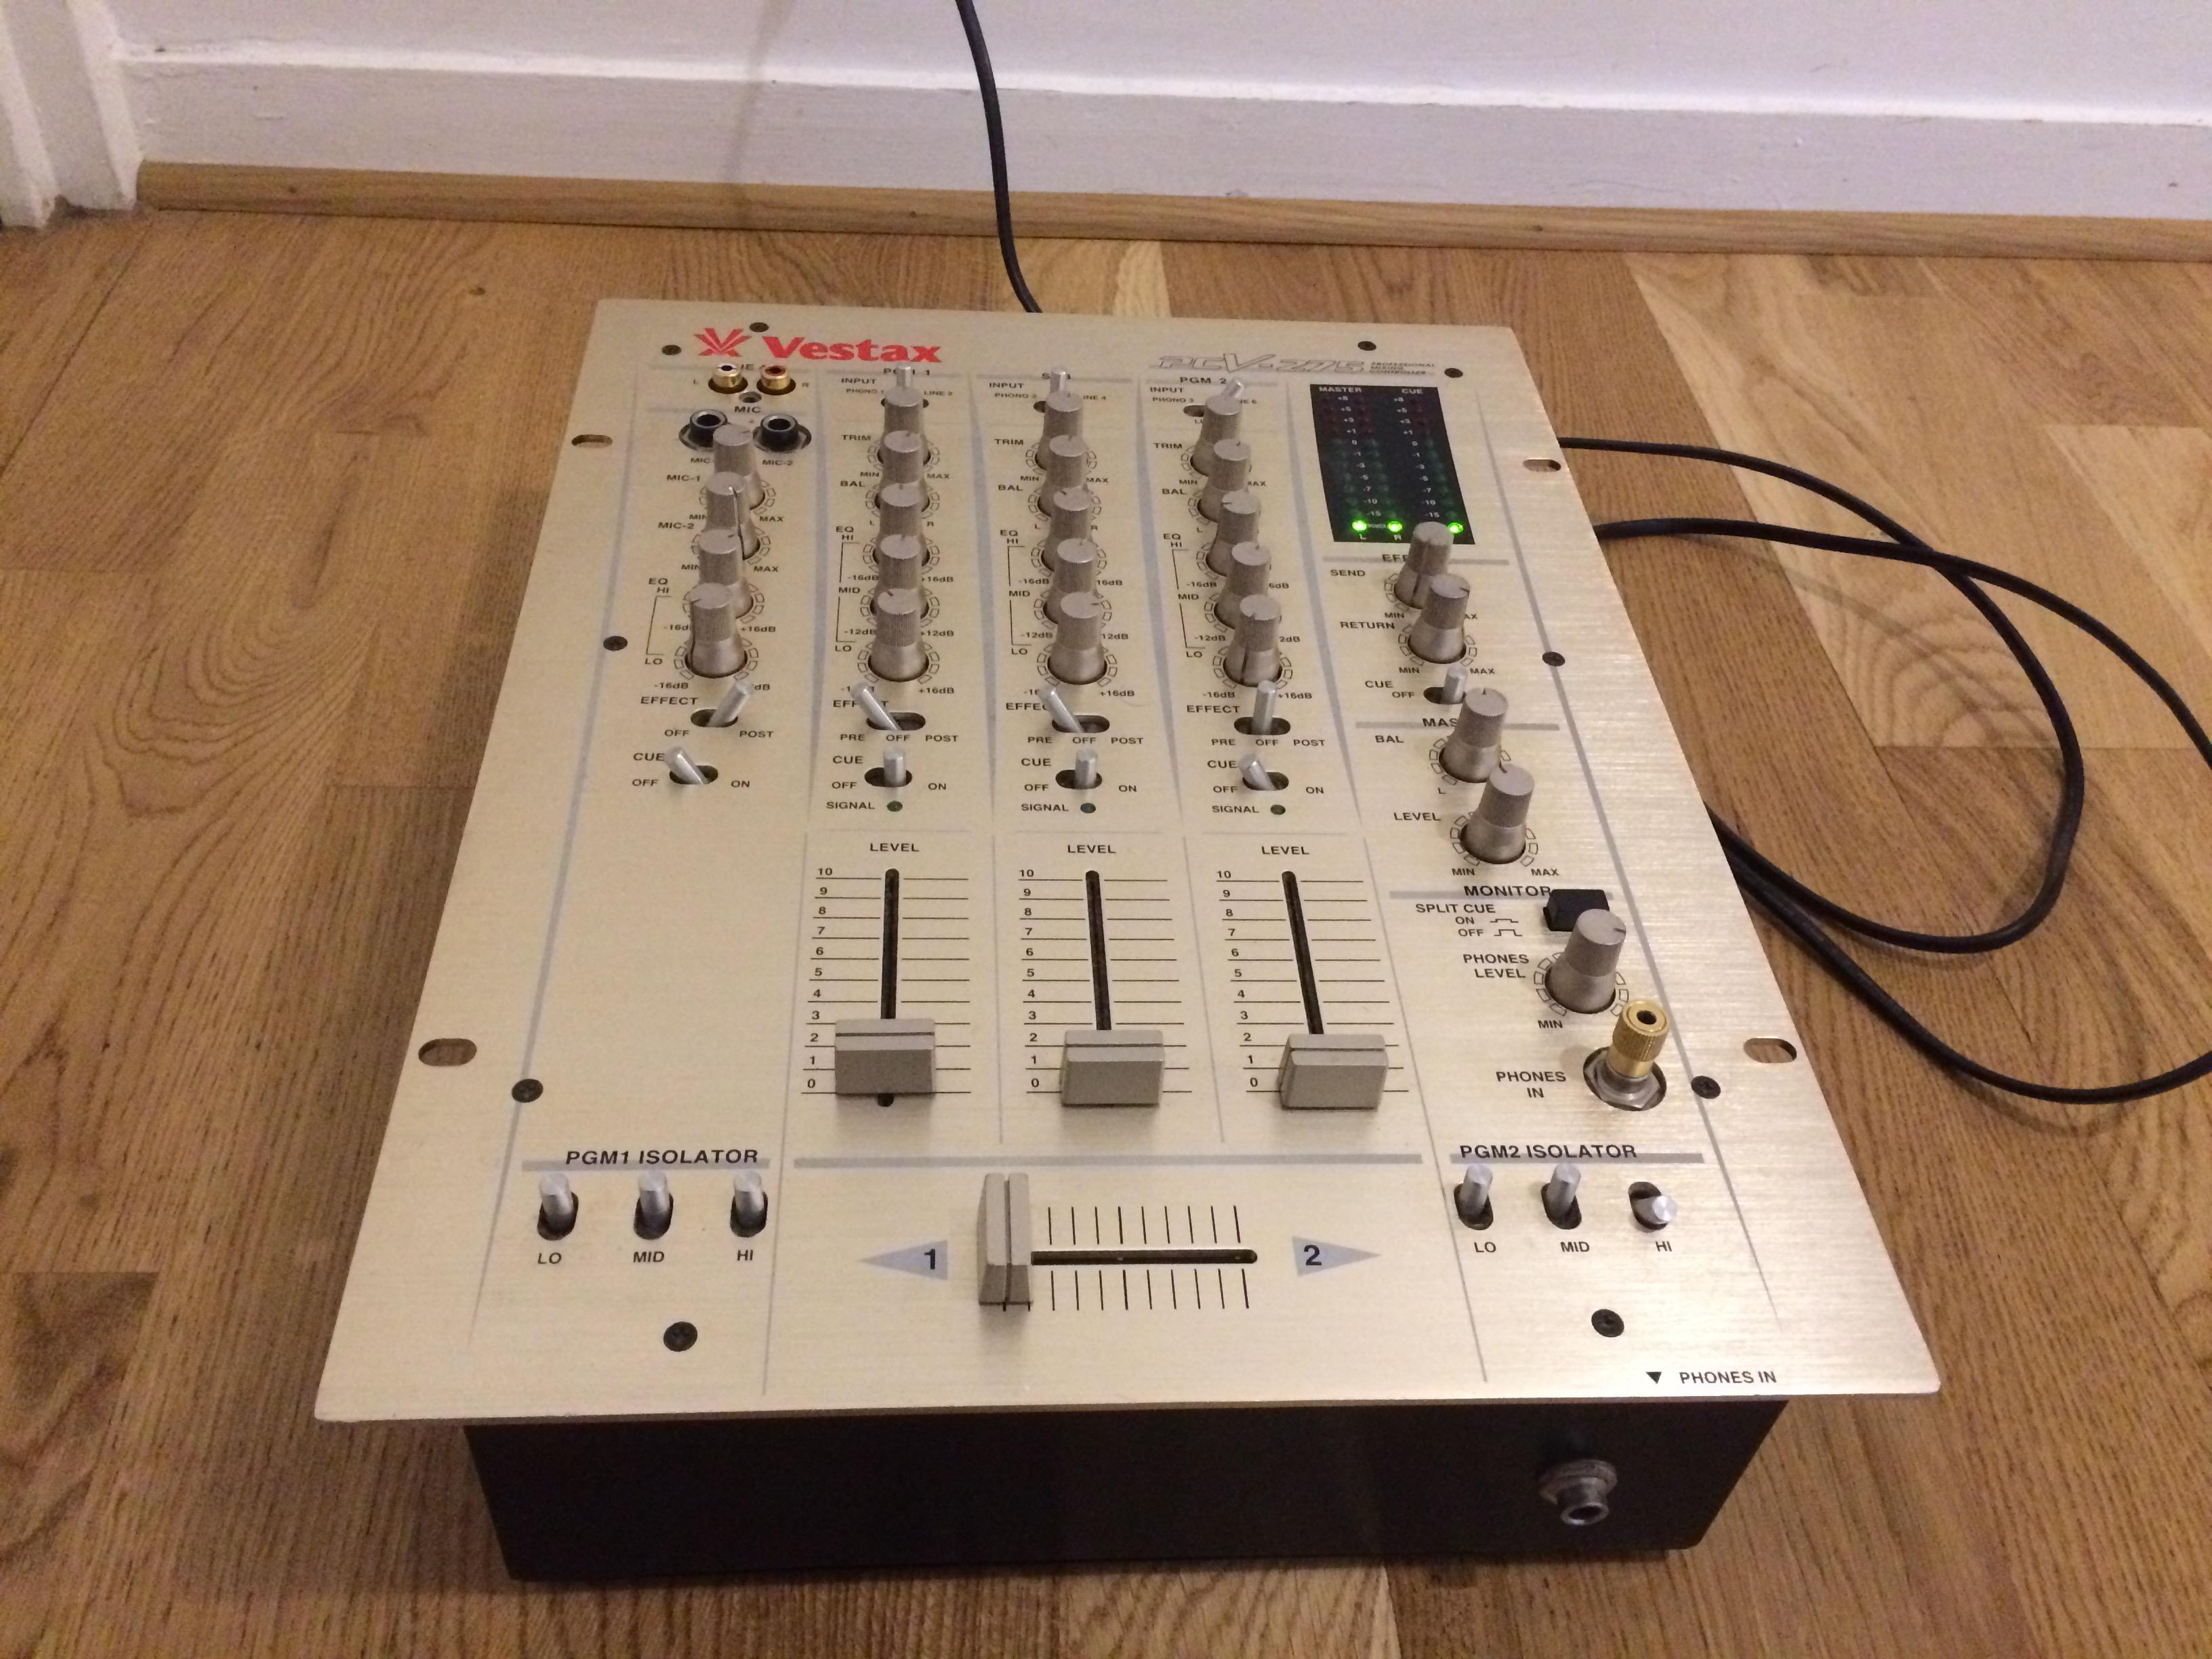 table de mixage vestax pcv 275